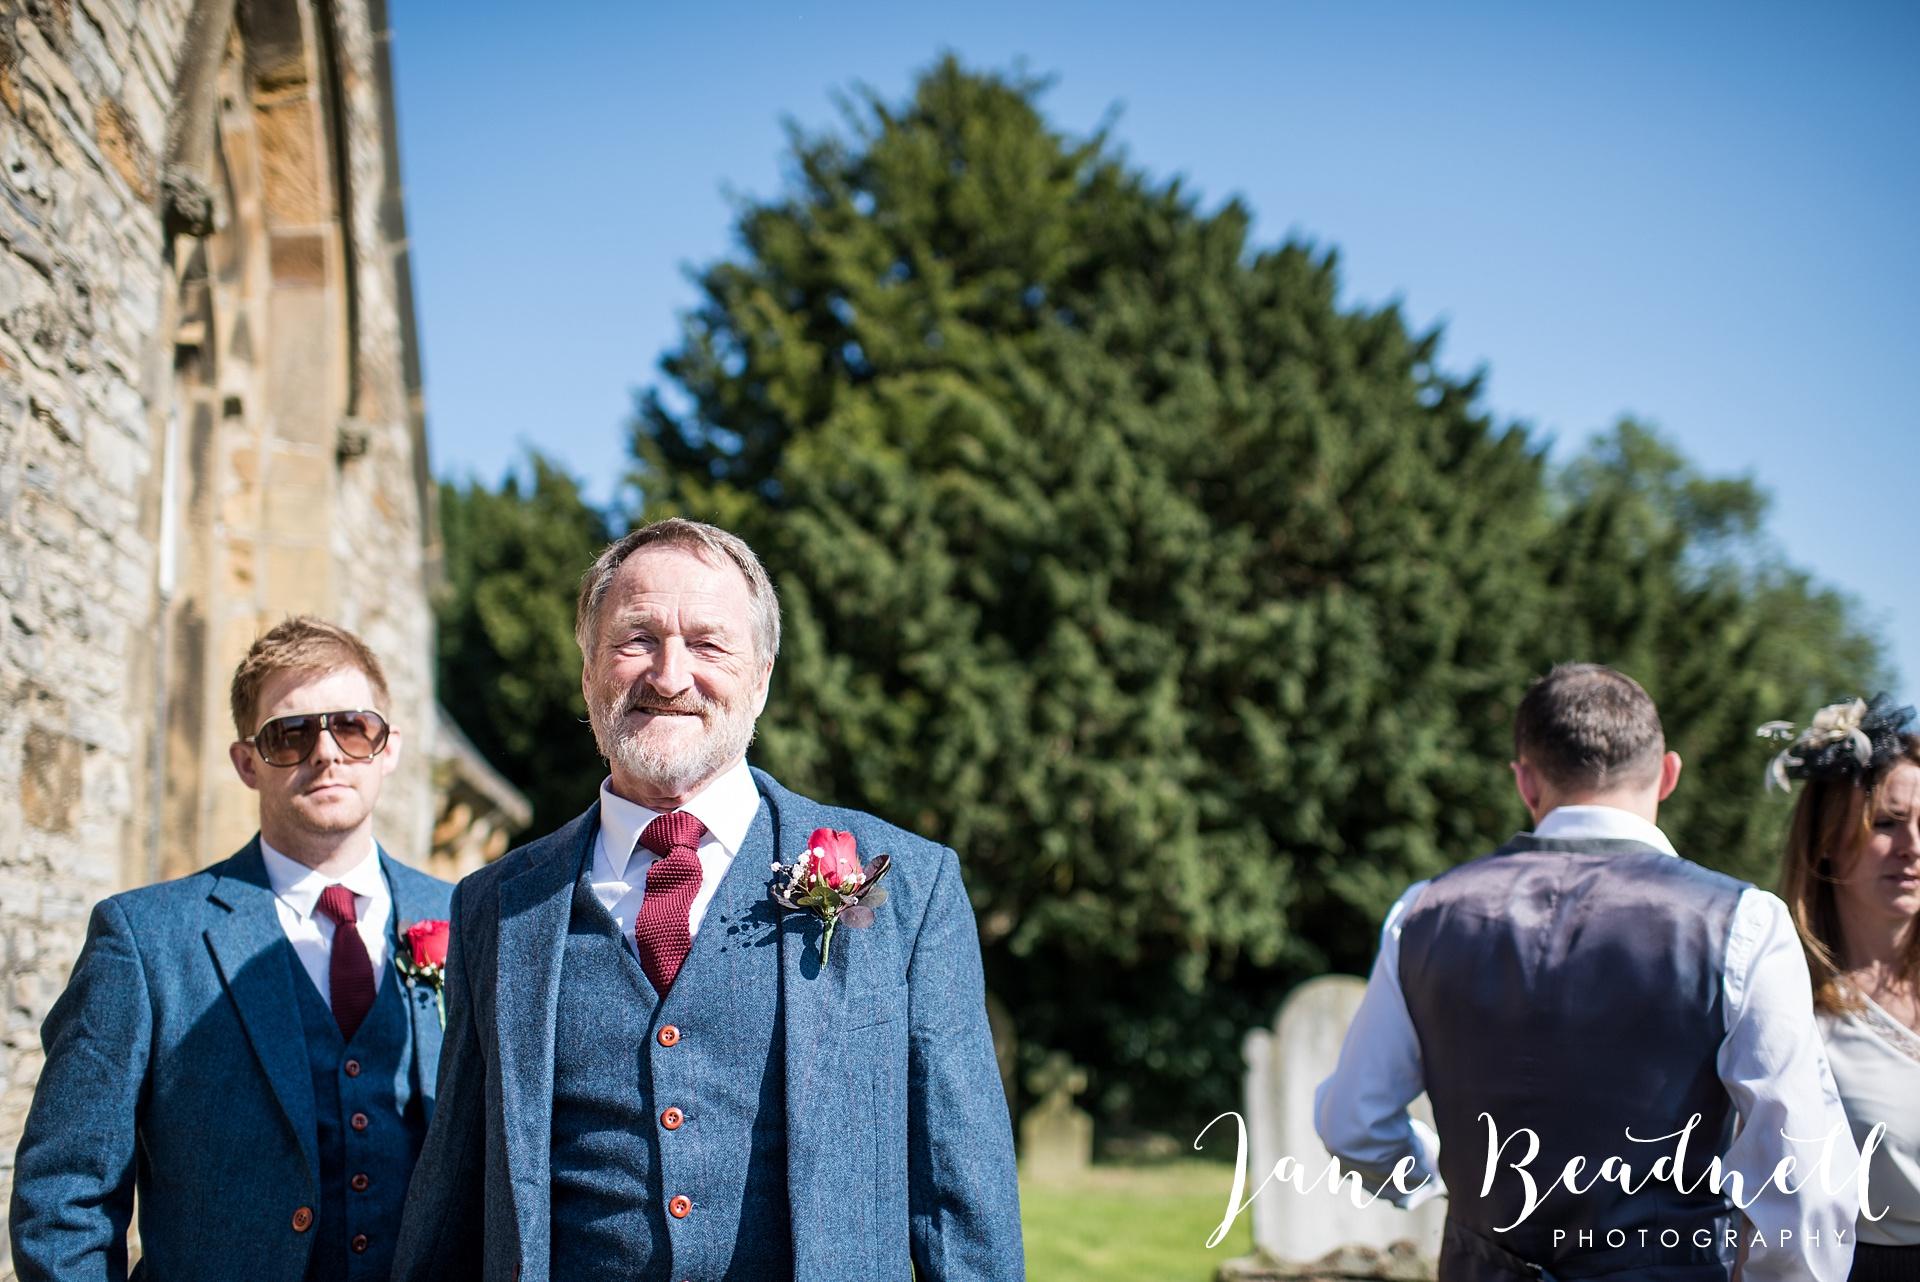 fine-art-wedding-photographer-jane-beadnell-yorkshire-wedding-photographer_0036